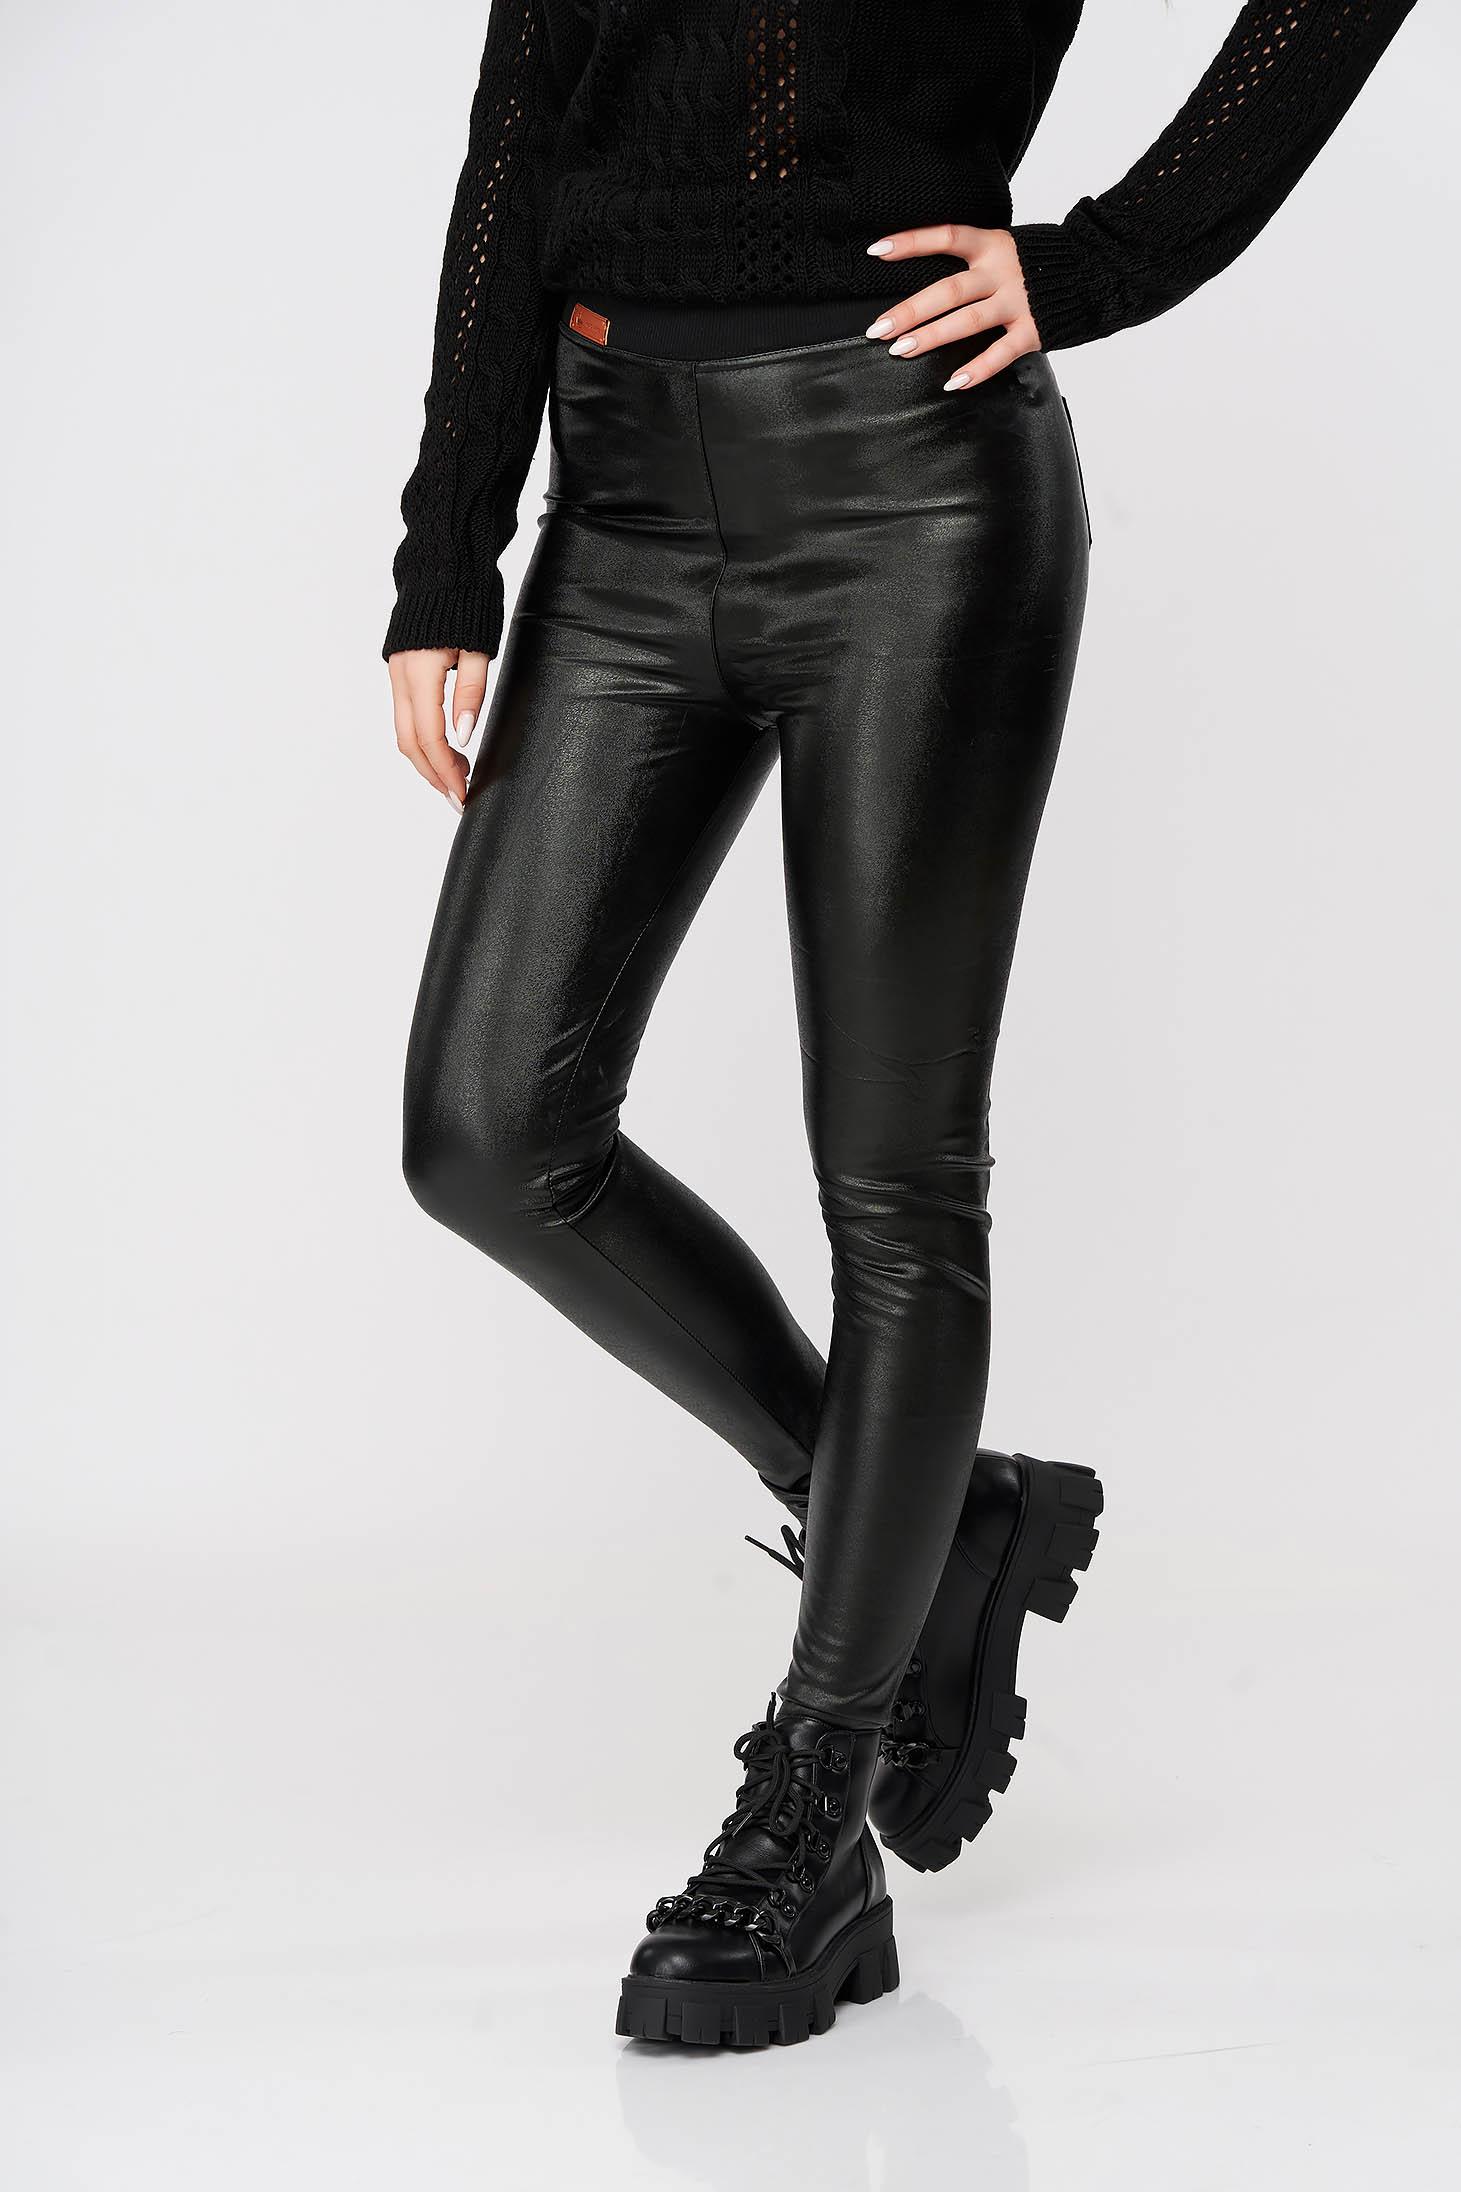 Black tights with elastic waist from shiny fabric medium waist